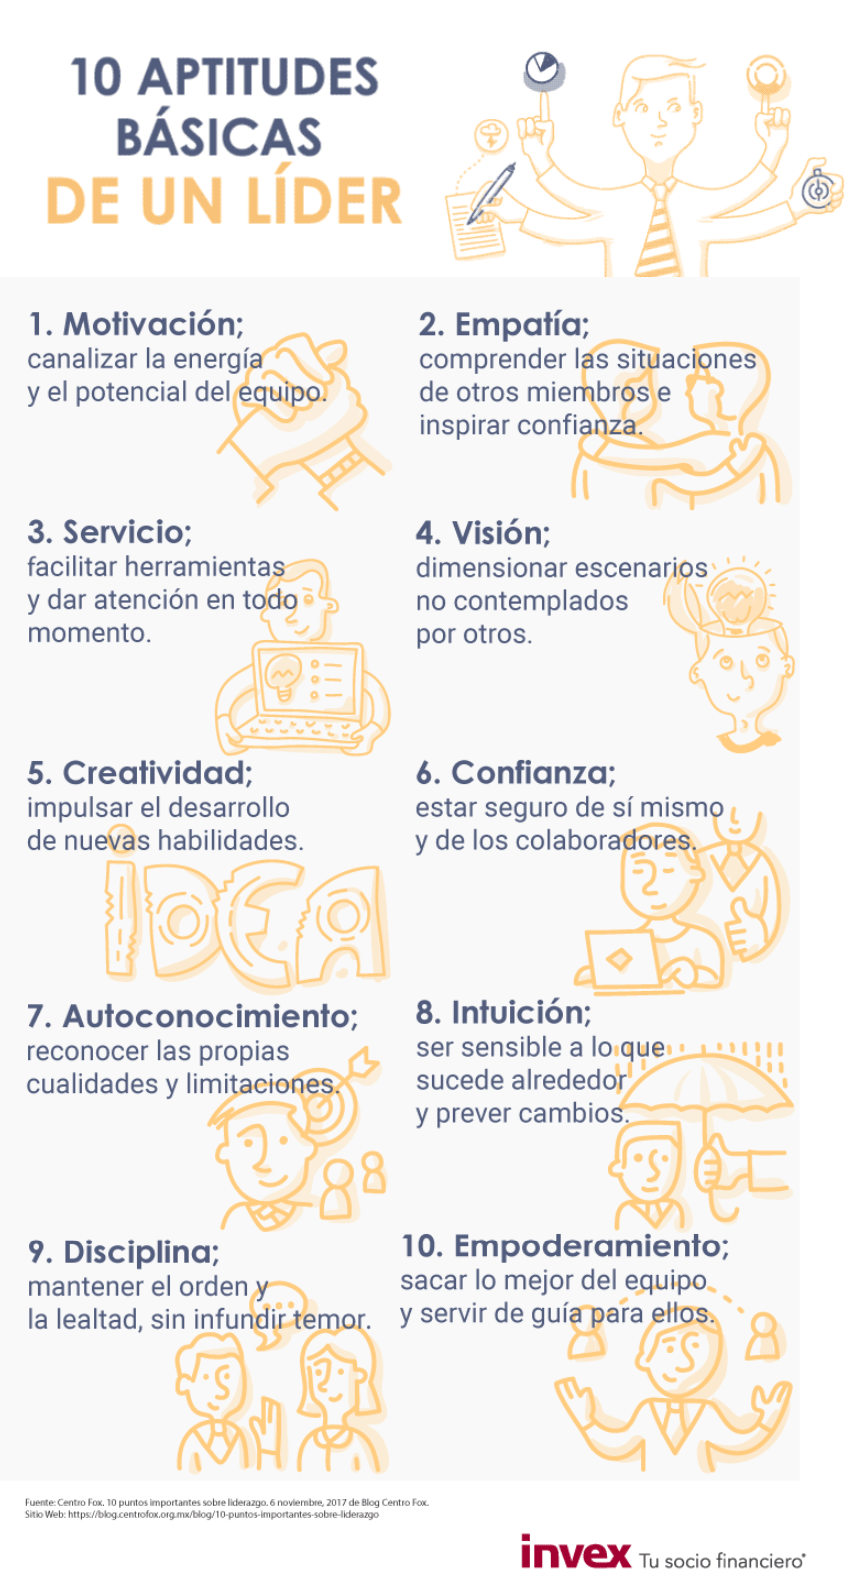 10 aptitudes básicas de un líder